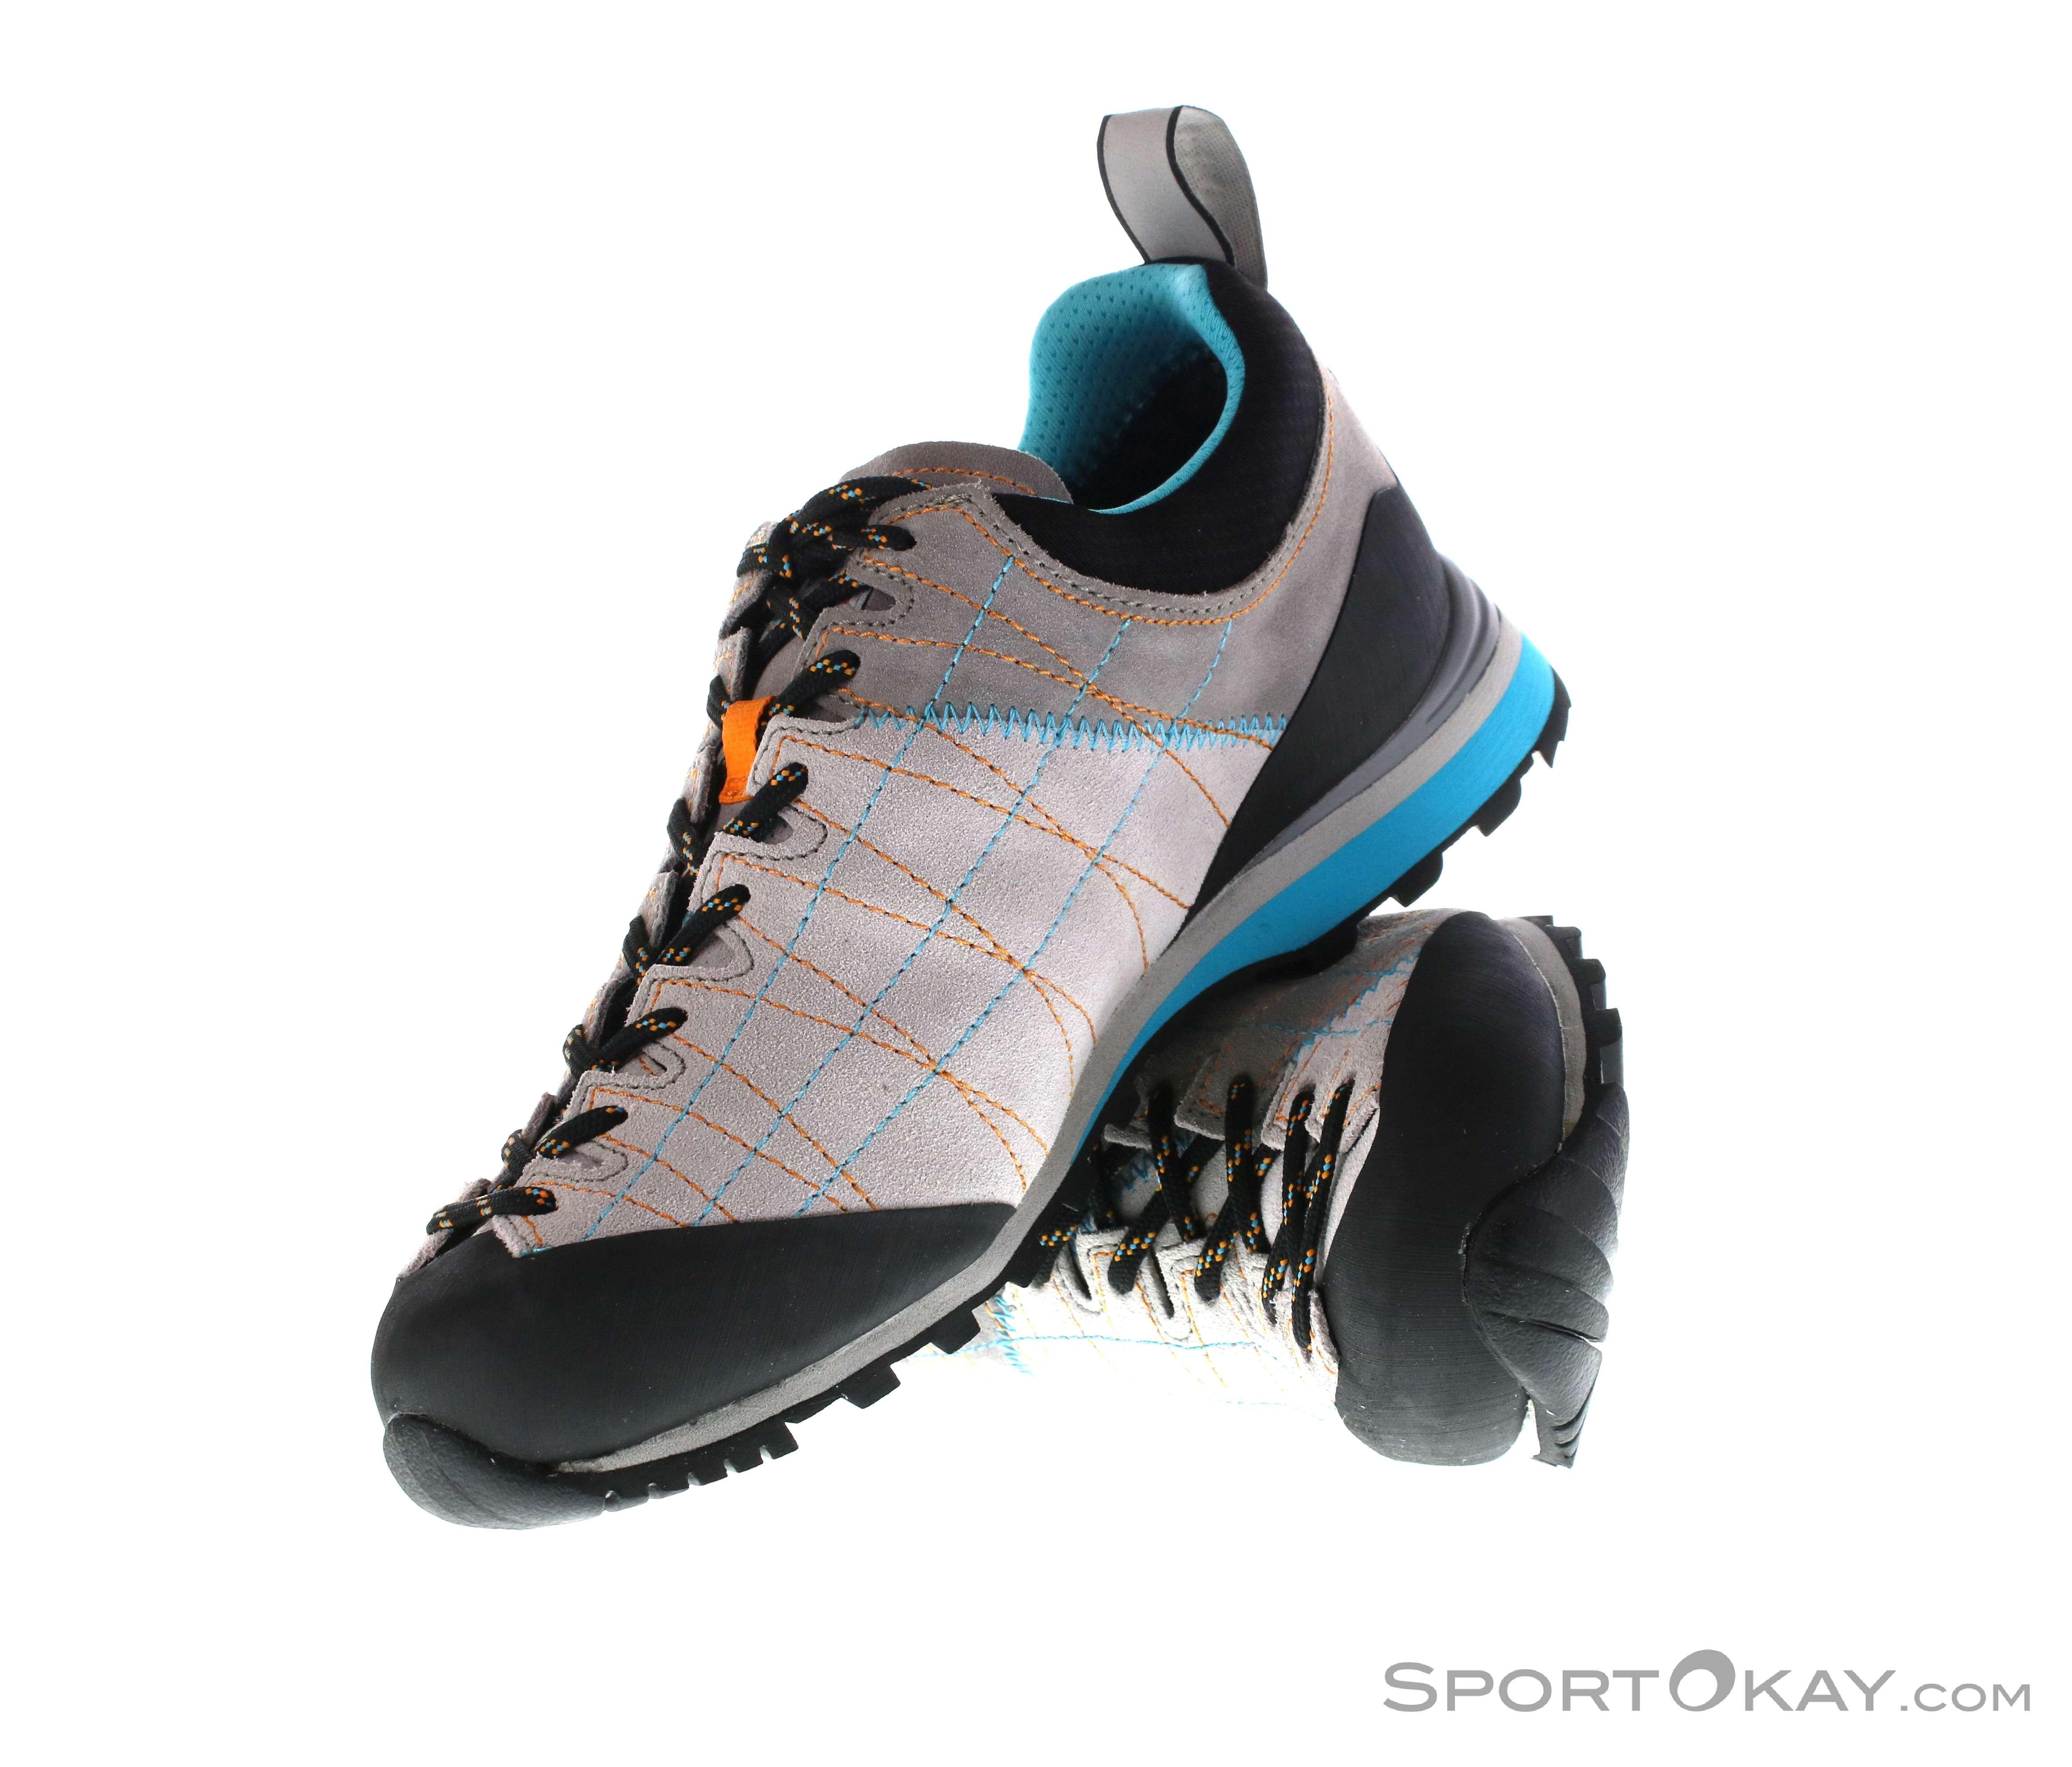 the latest 246b3 d54cc Dolomite Dolomite Diagonal GTX Donna Scarpe da Trekking Gore-Tex